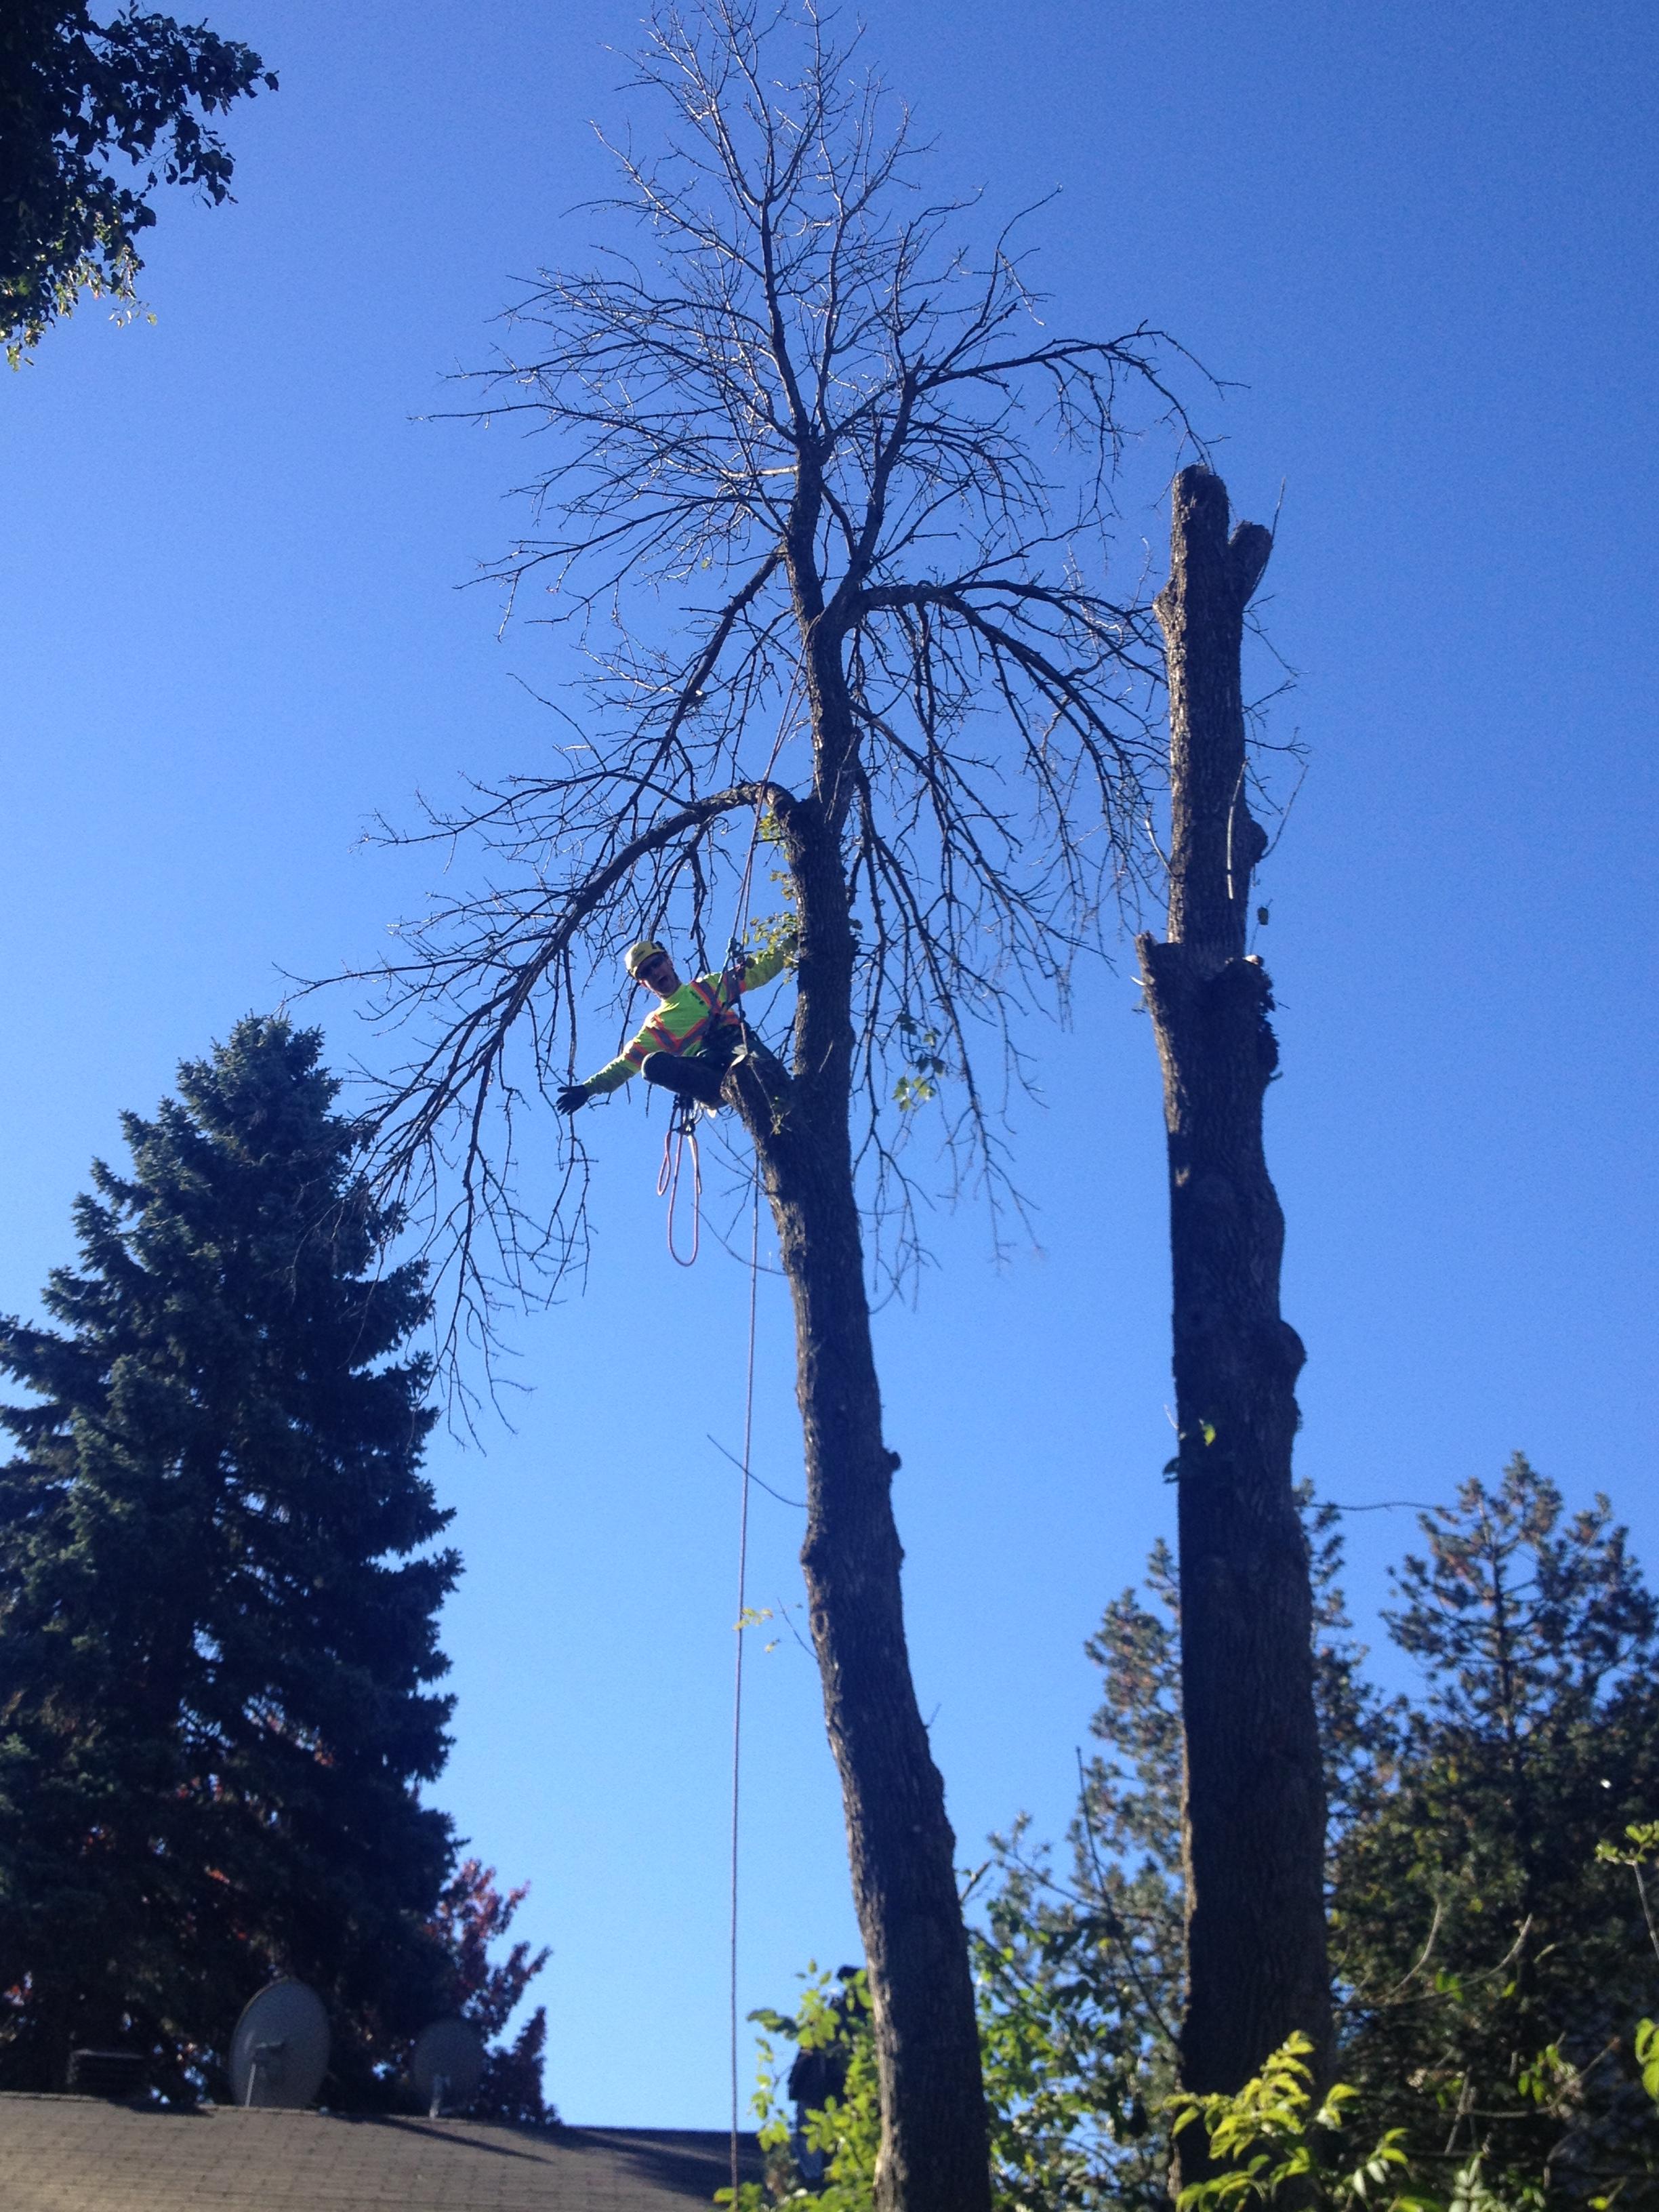 Arborist, Tree Service - Img 4993